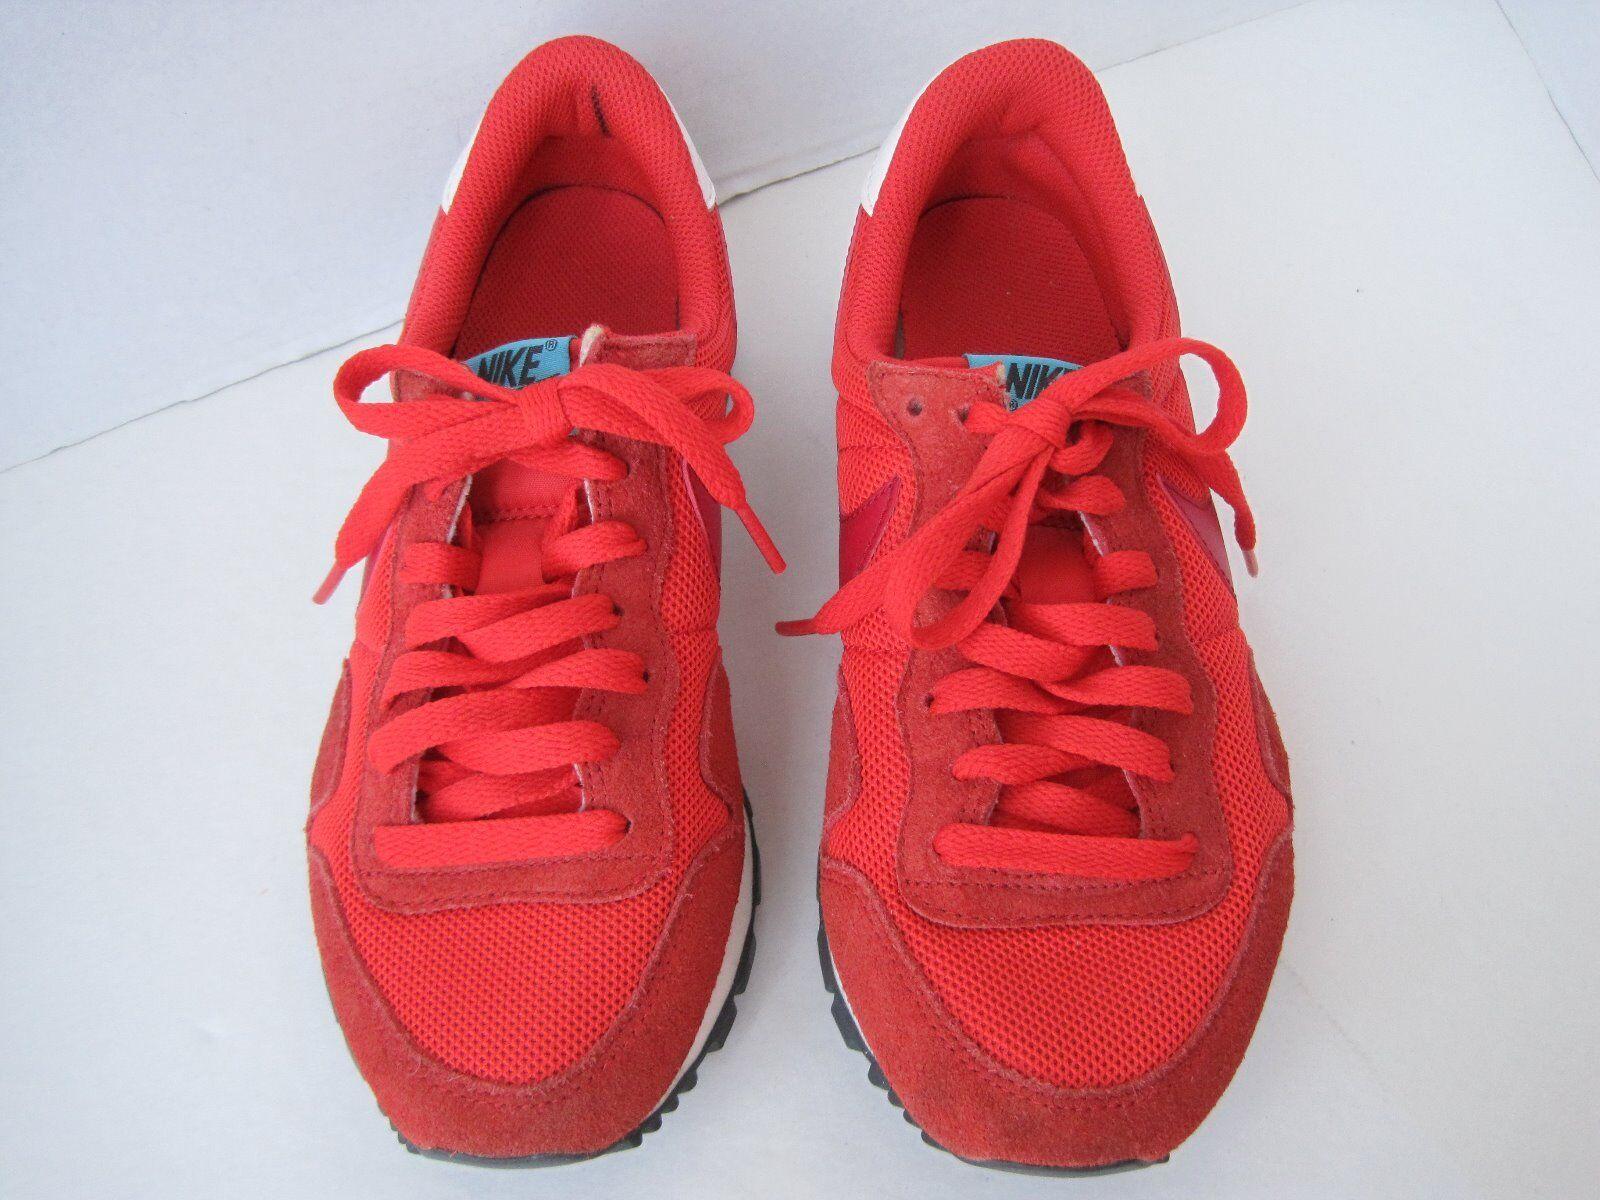 599124-600 Men's Sz 8  Nike Air Pegasus '13 Running Shoe Red/Orange w/Blue/Grn Comfortable and good-looking